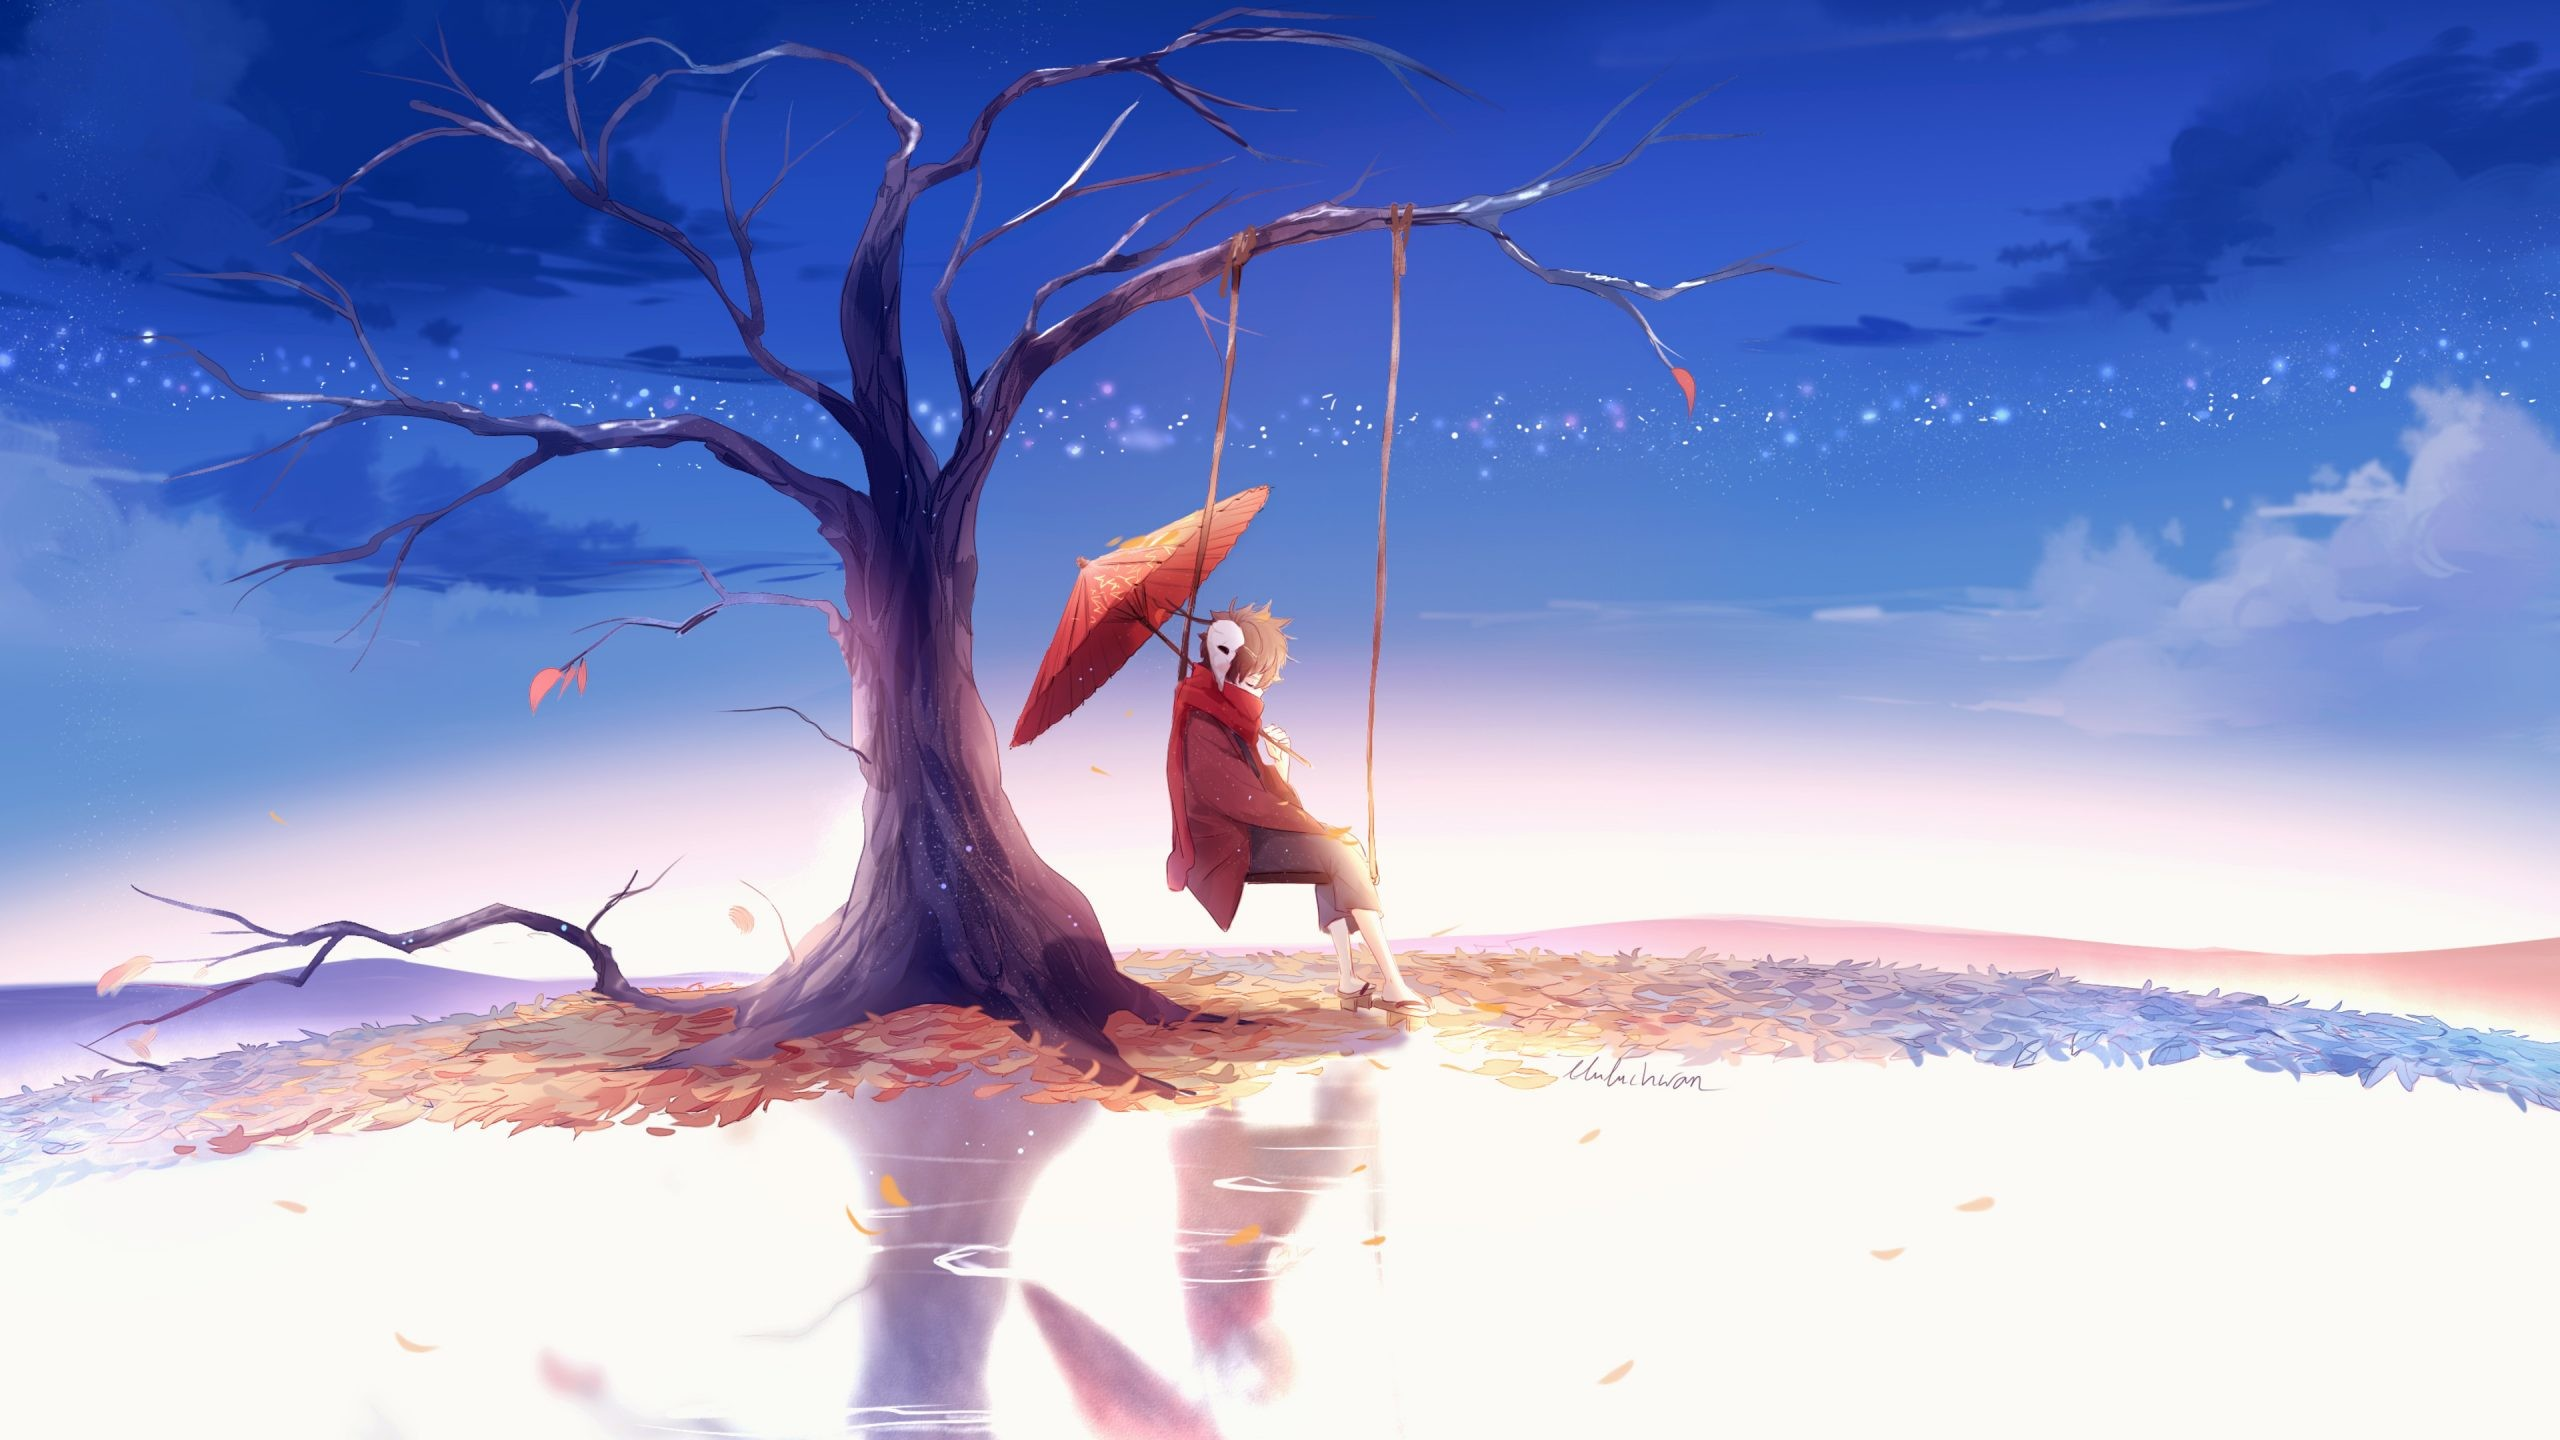 Res: 2560x1440, Sad Anime Painting Wallpaper